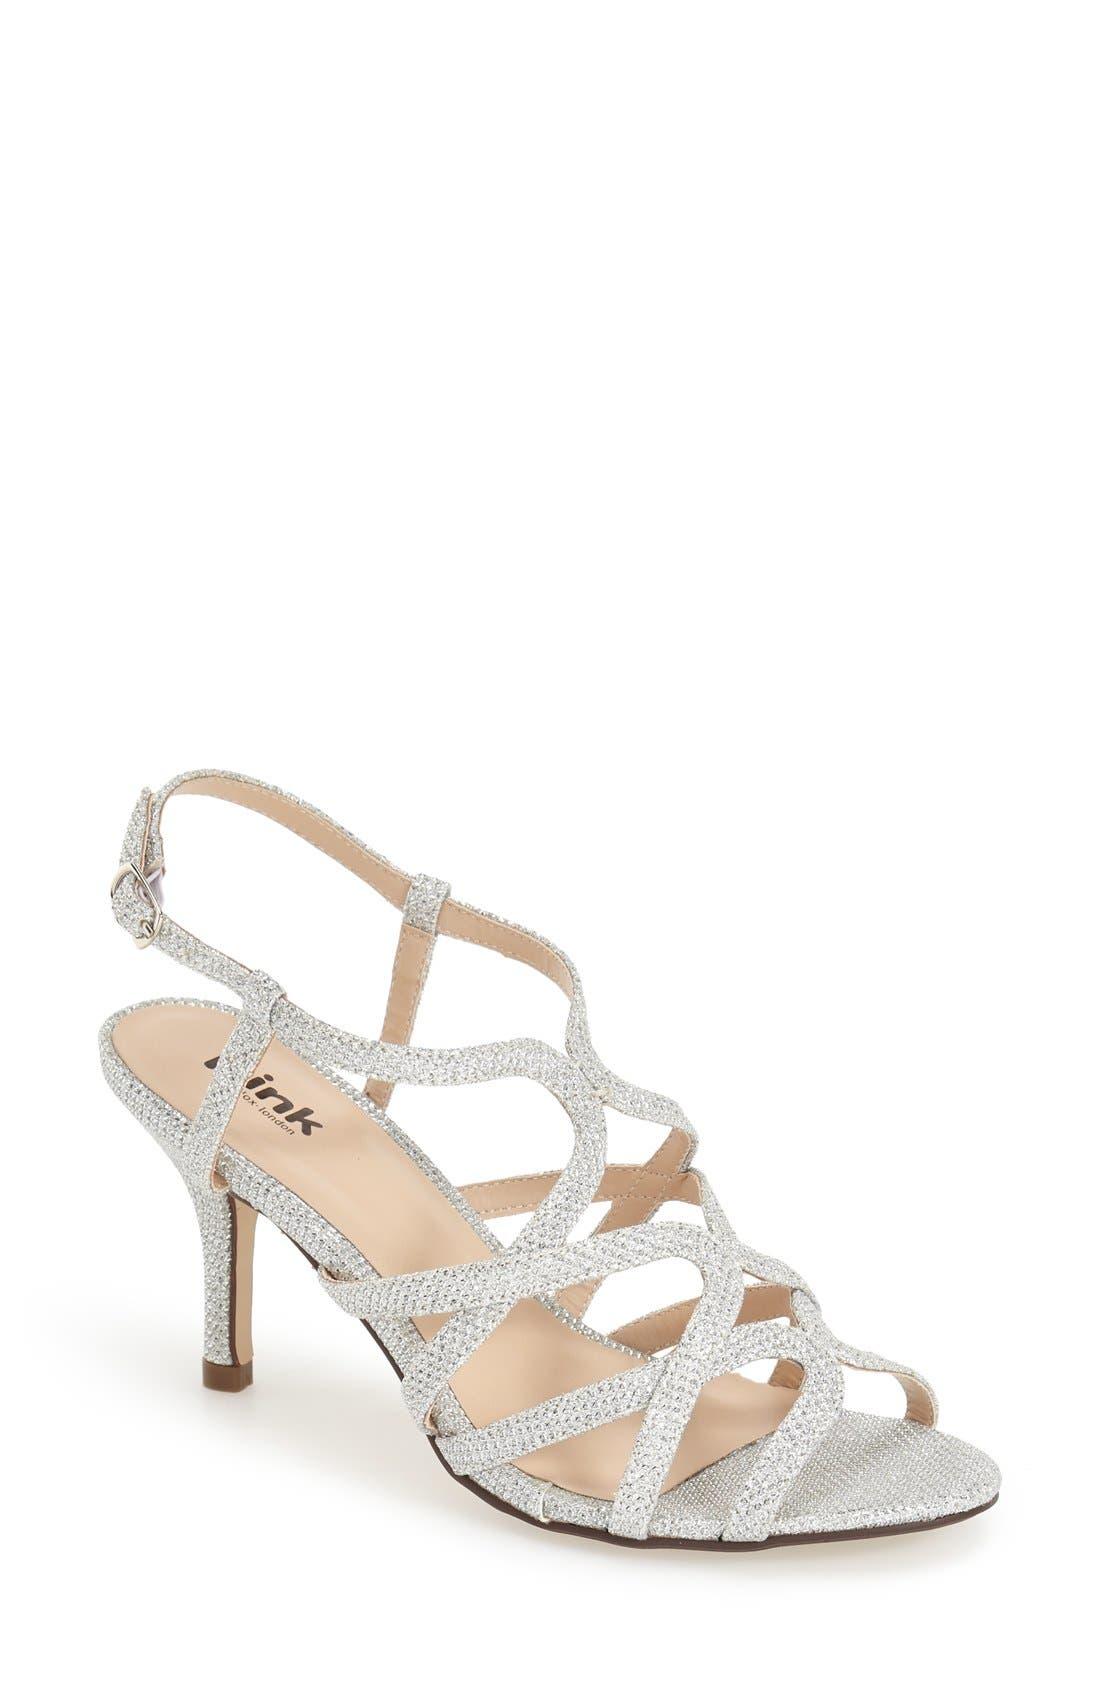 'Rich Glitter' Sandal,                         Main,                         color, SILVER GLITTER MESH